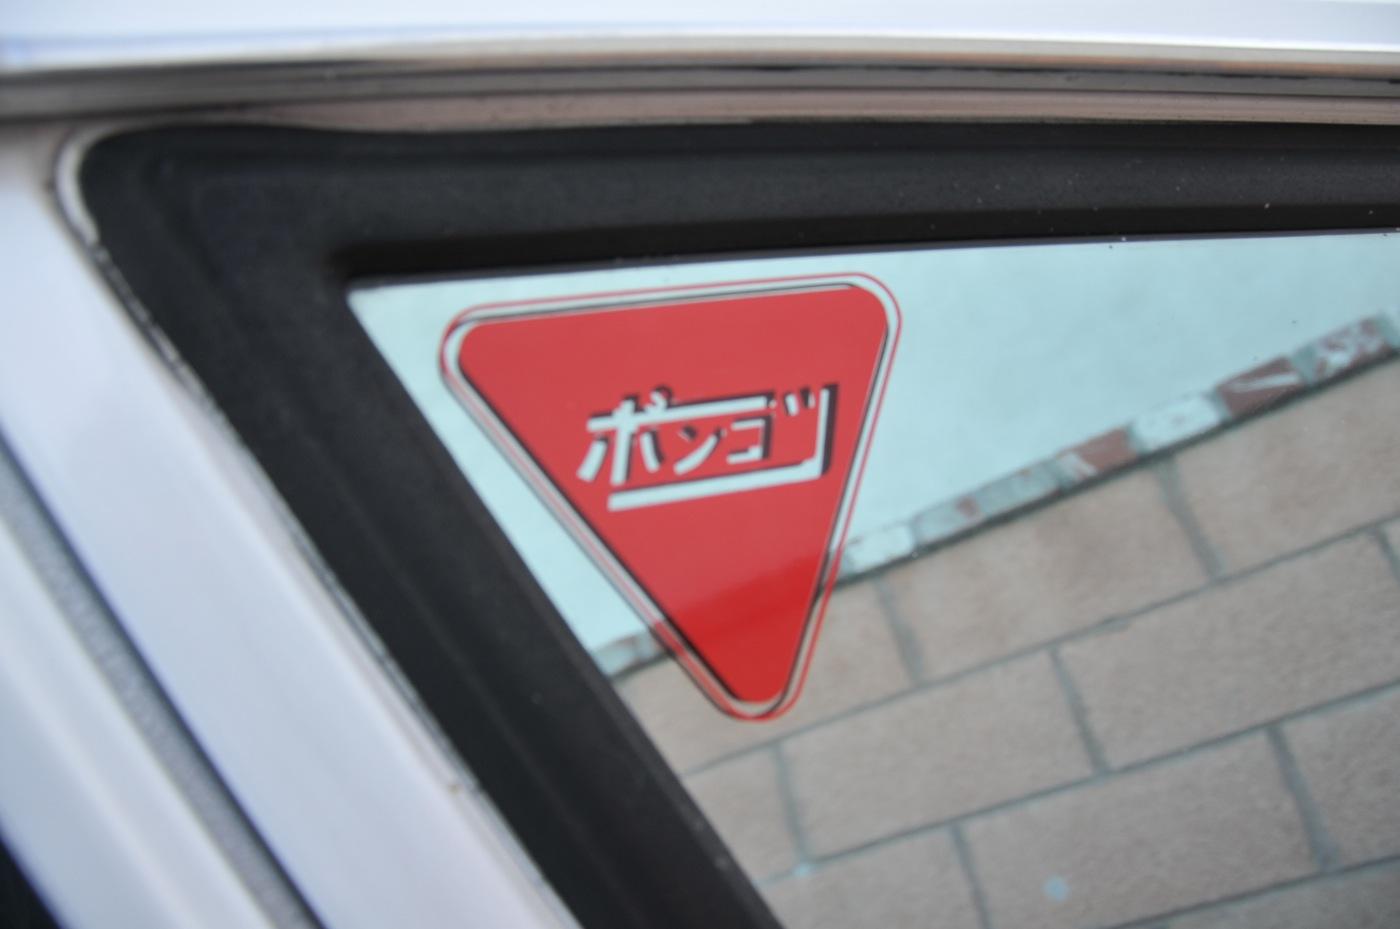 Goki, ponkotsu sticker, Datsun 510